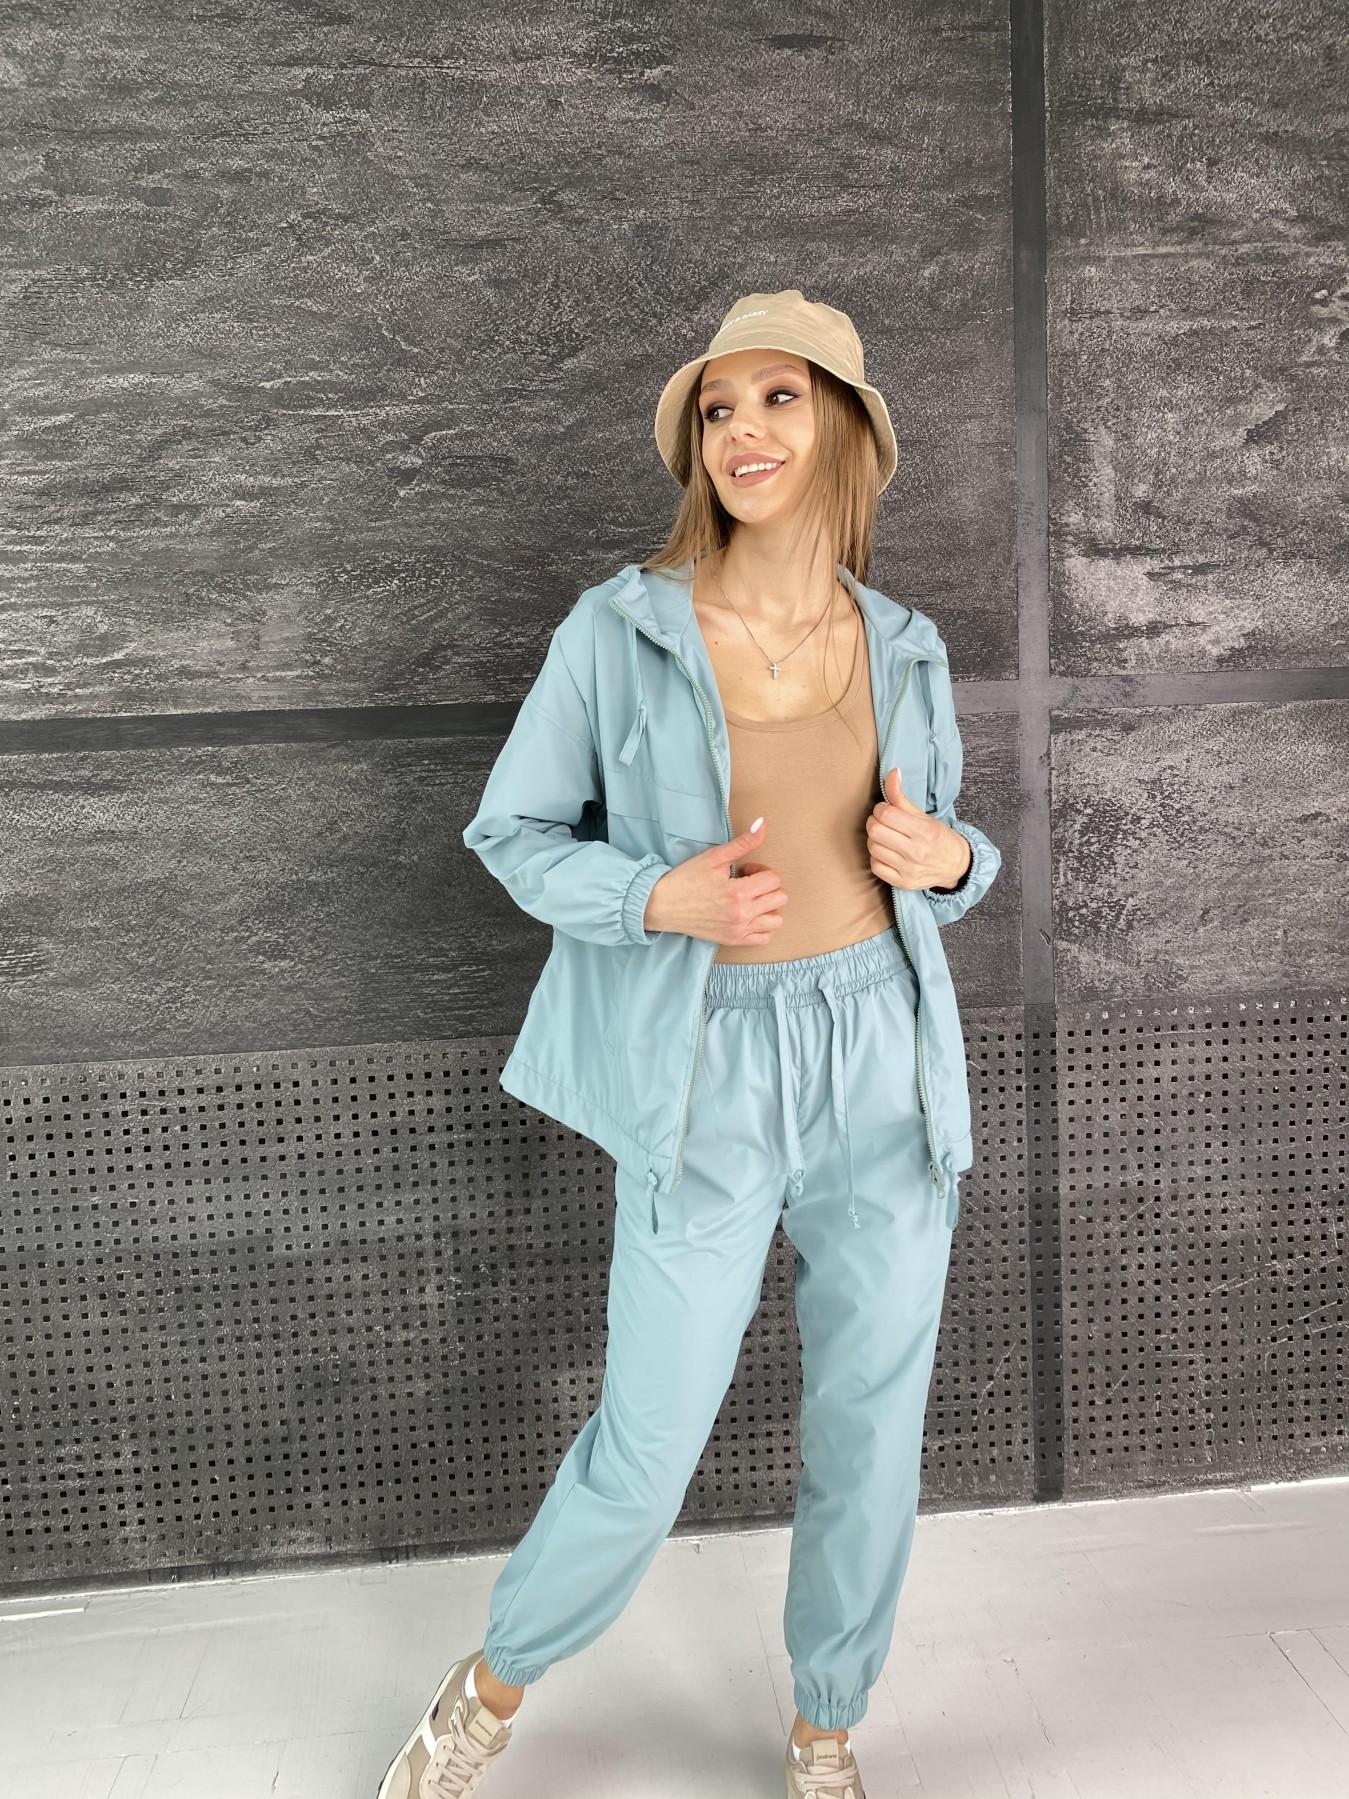 Фит костюм  из плащевой ткани Astra 11052 АРТ. 47536 Цвет: Олива - фото 3, интернет магазин tm-modus.ru